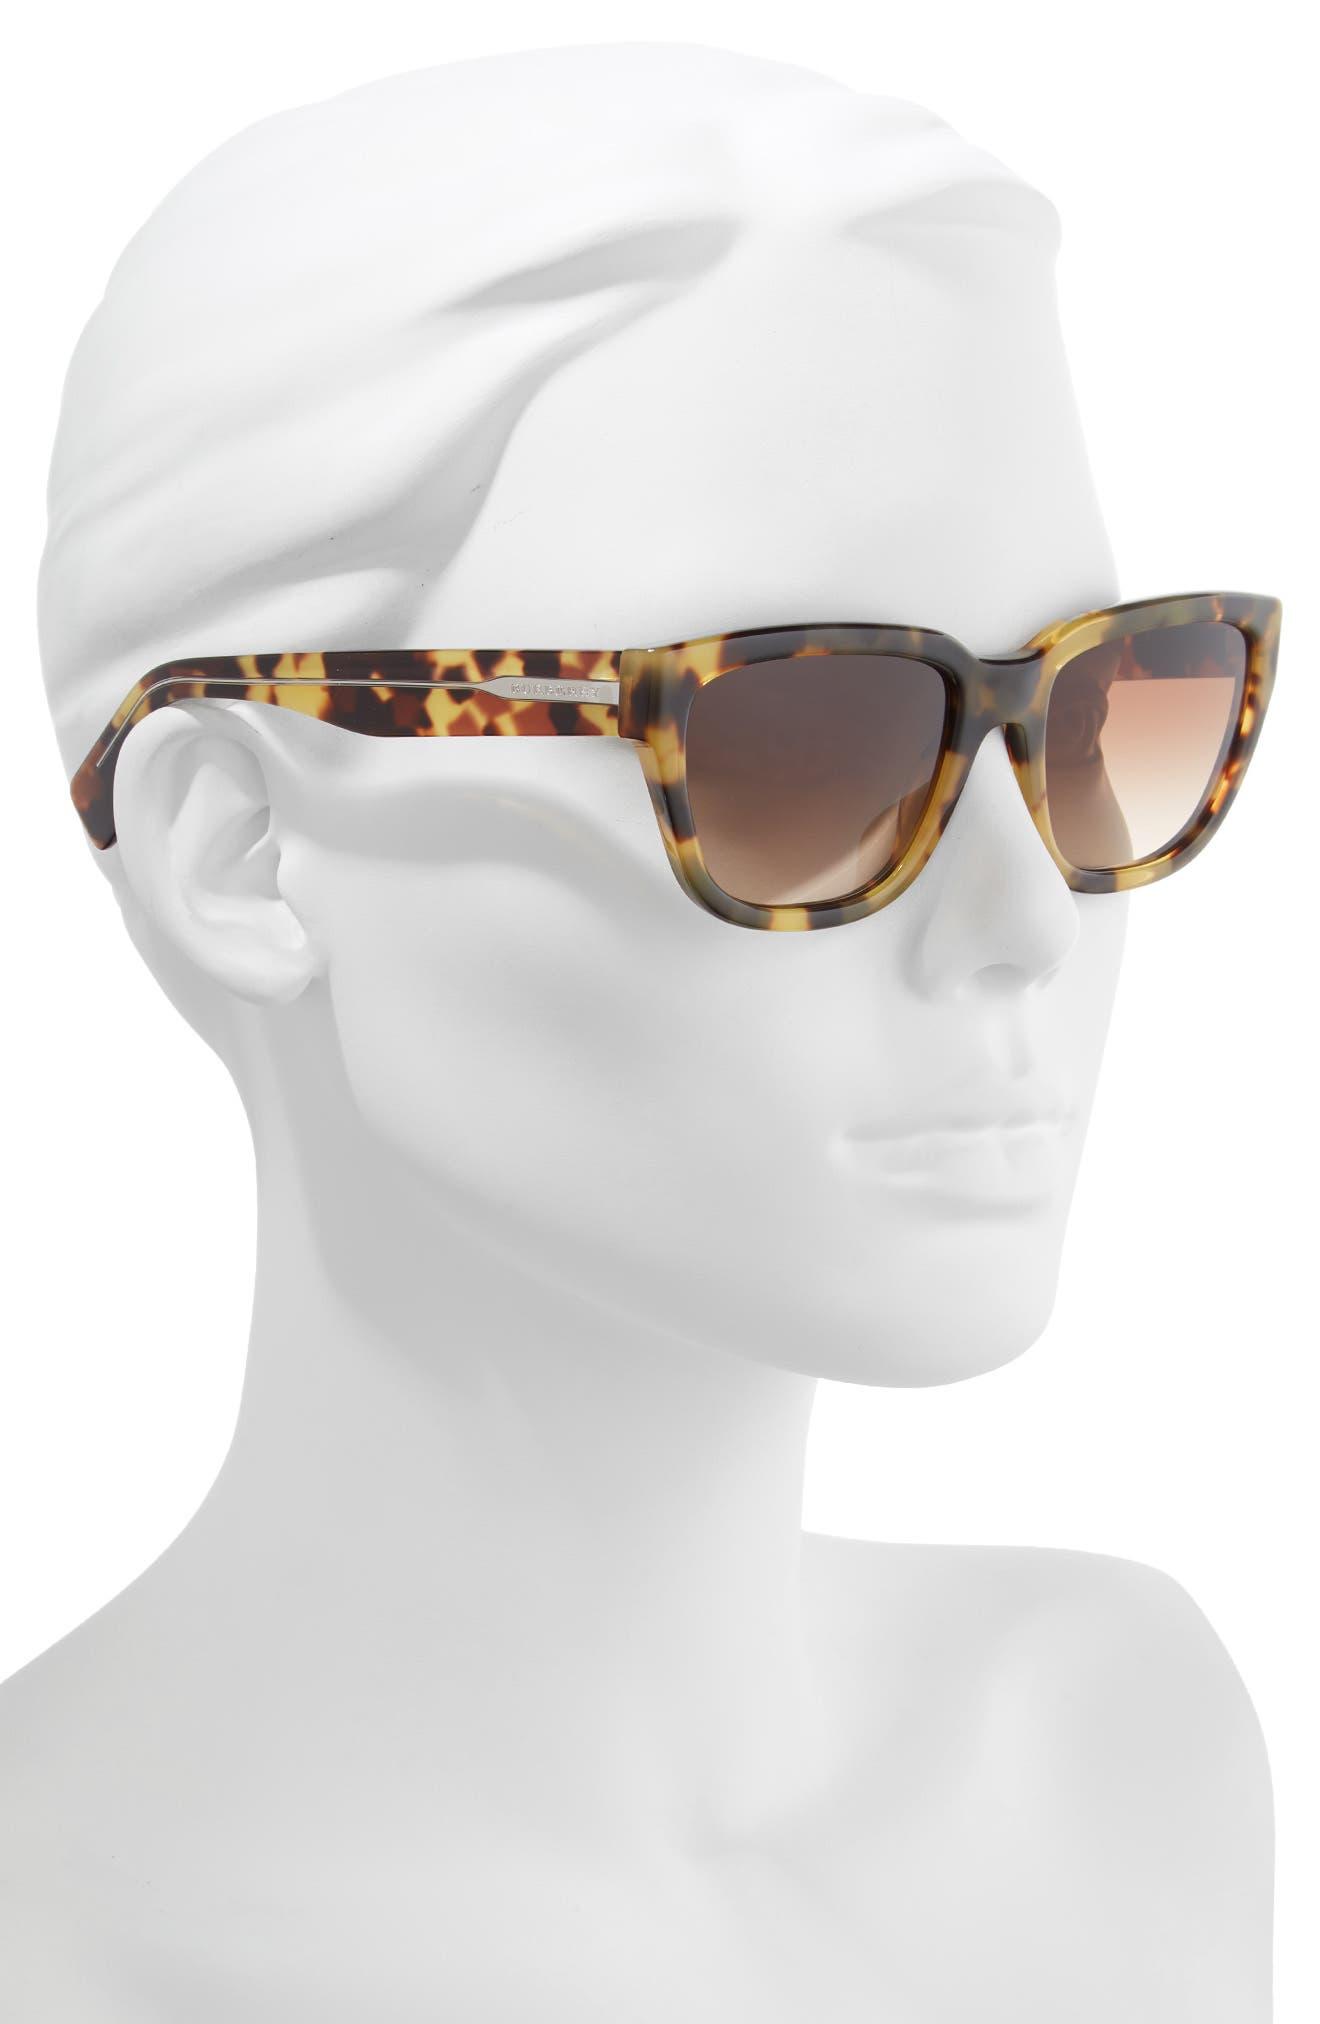 54mm Square Sunglasses,                             Alternate thumbnail 2, color,                             LITE HAVANA/ BROWN GRADIENT